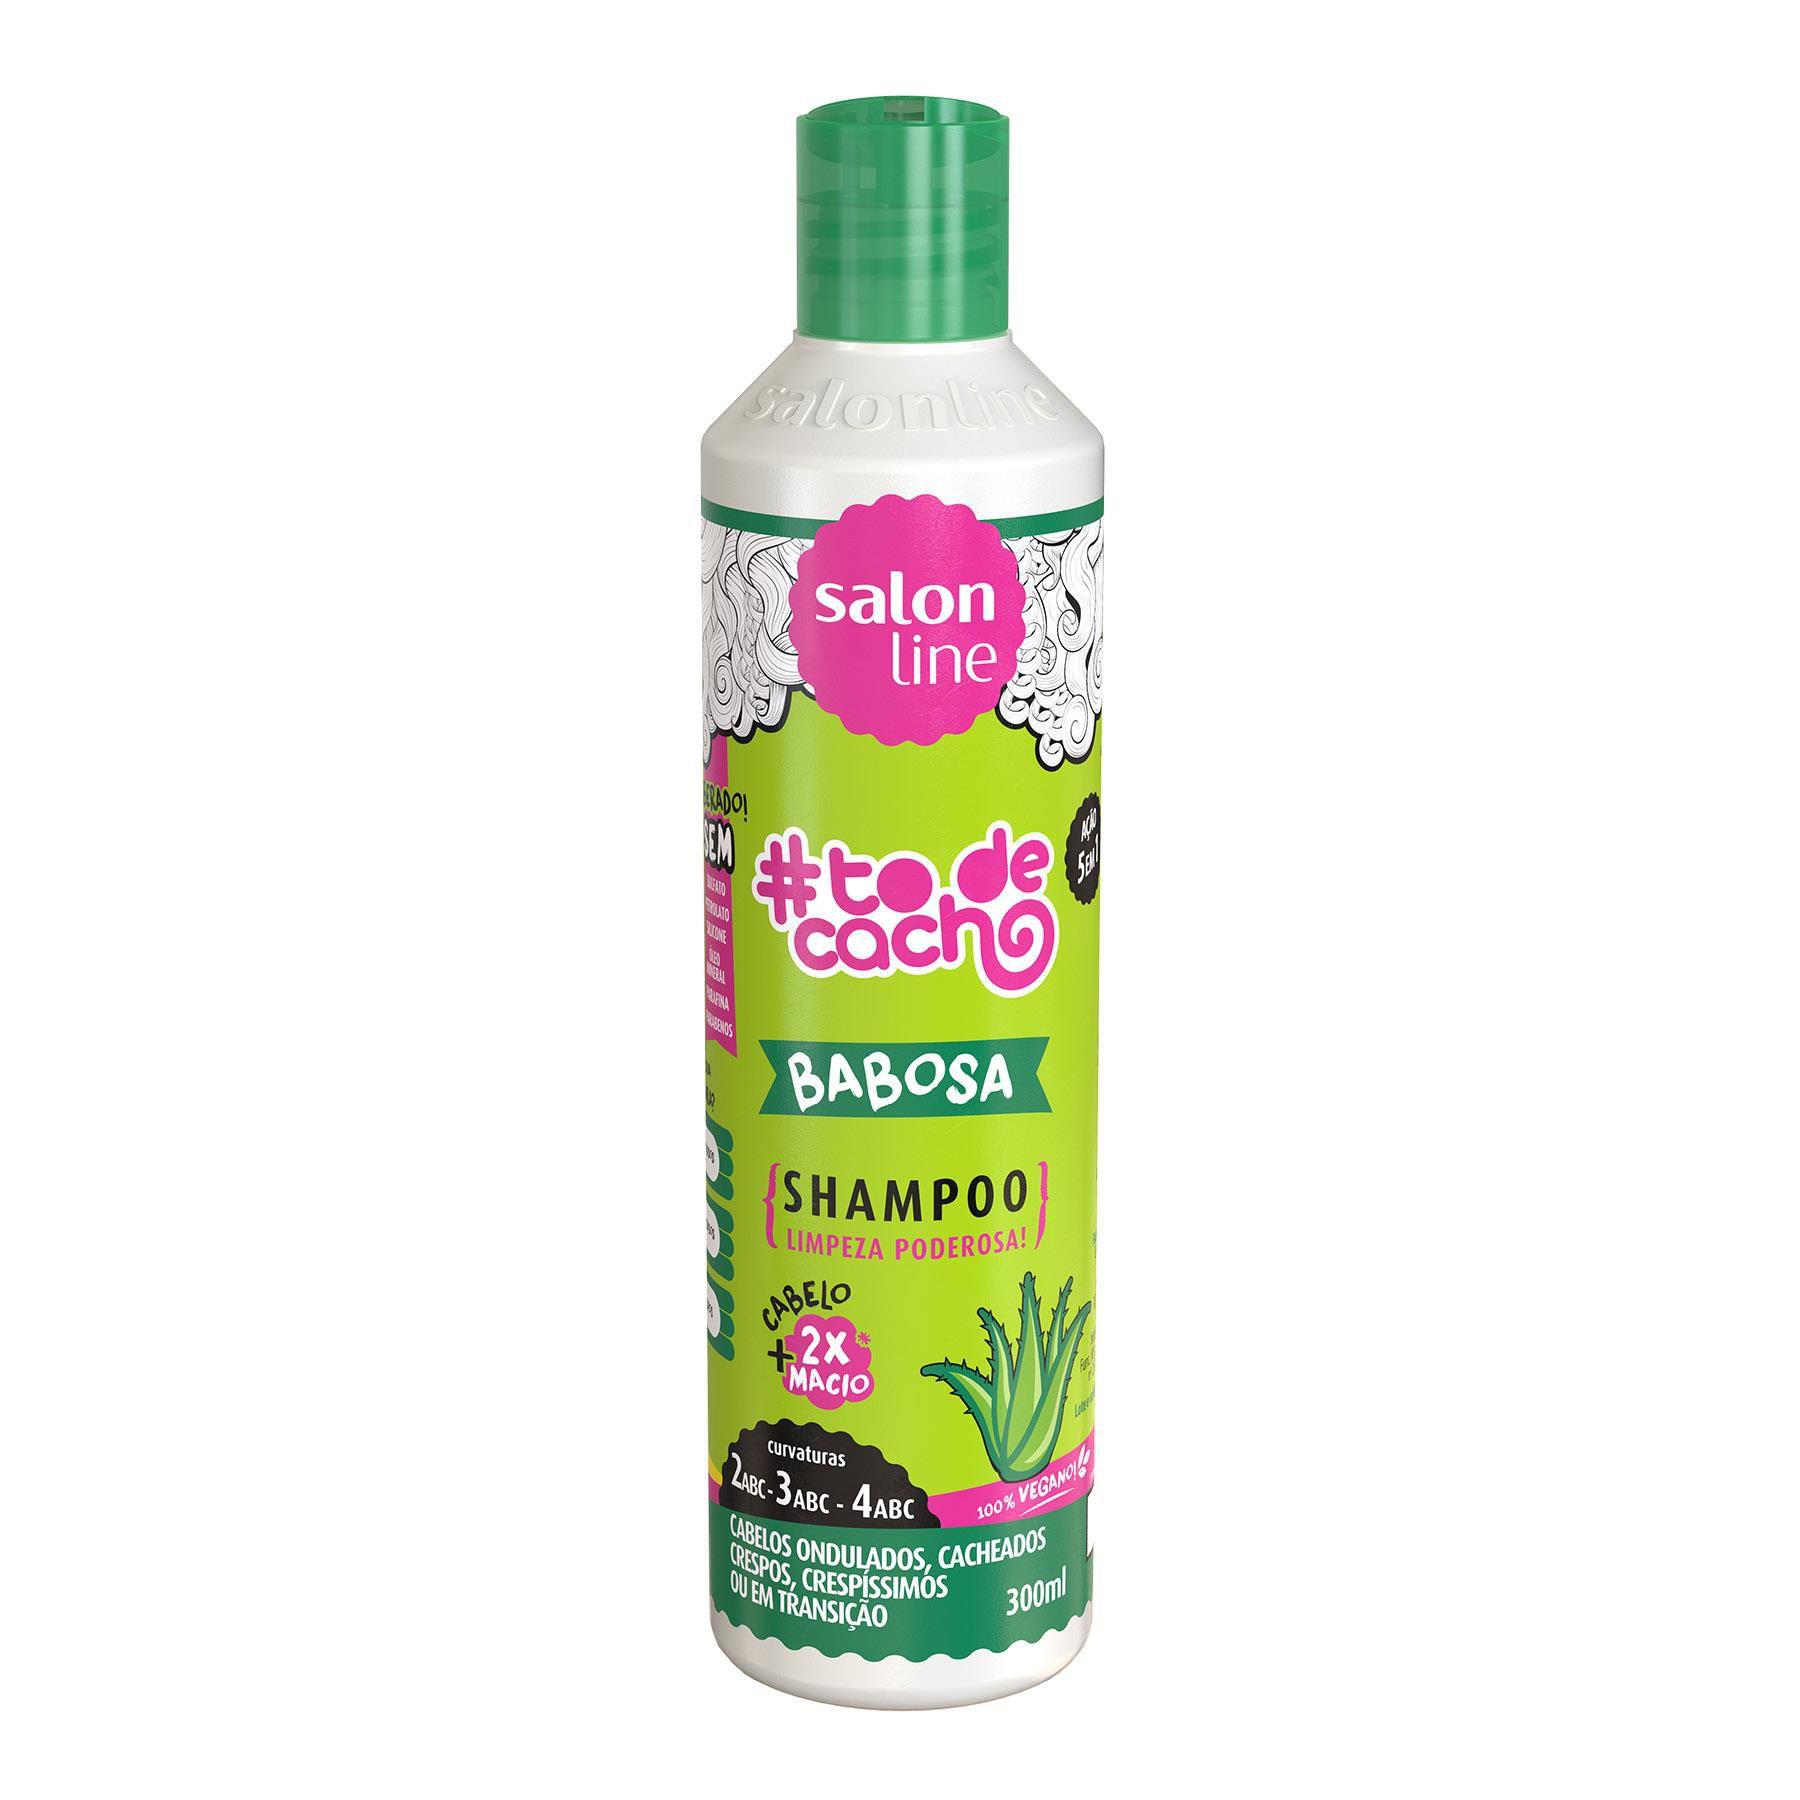 Salon Line Shampoo #TodeCacho Babosa  300ml